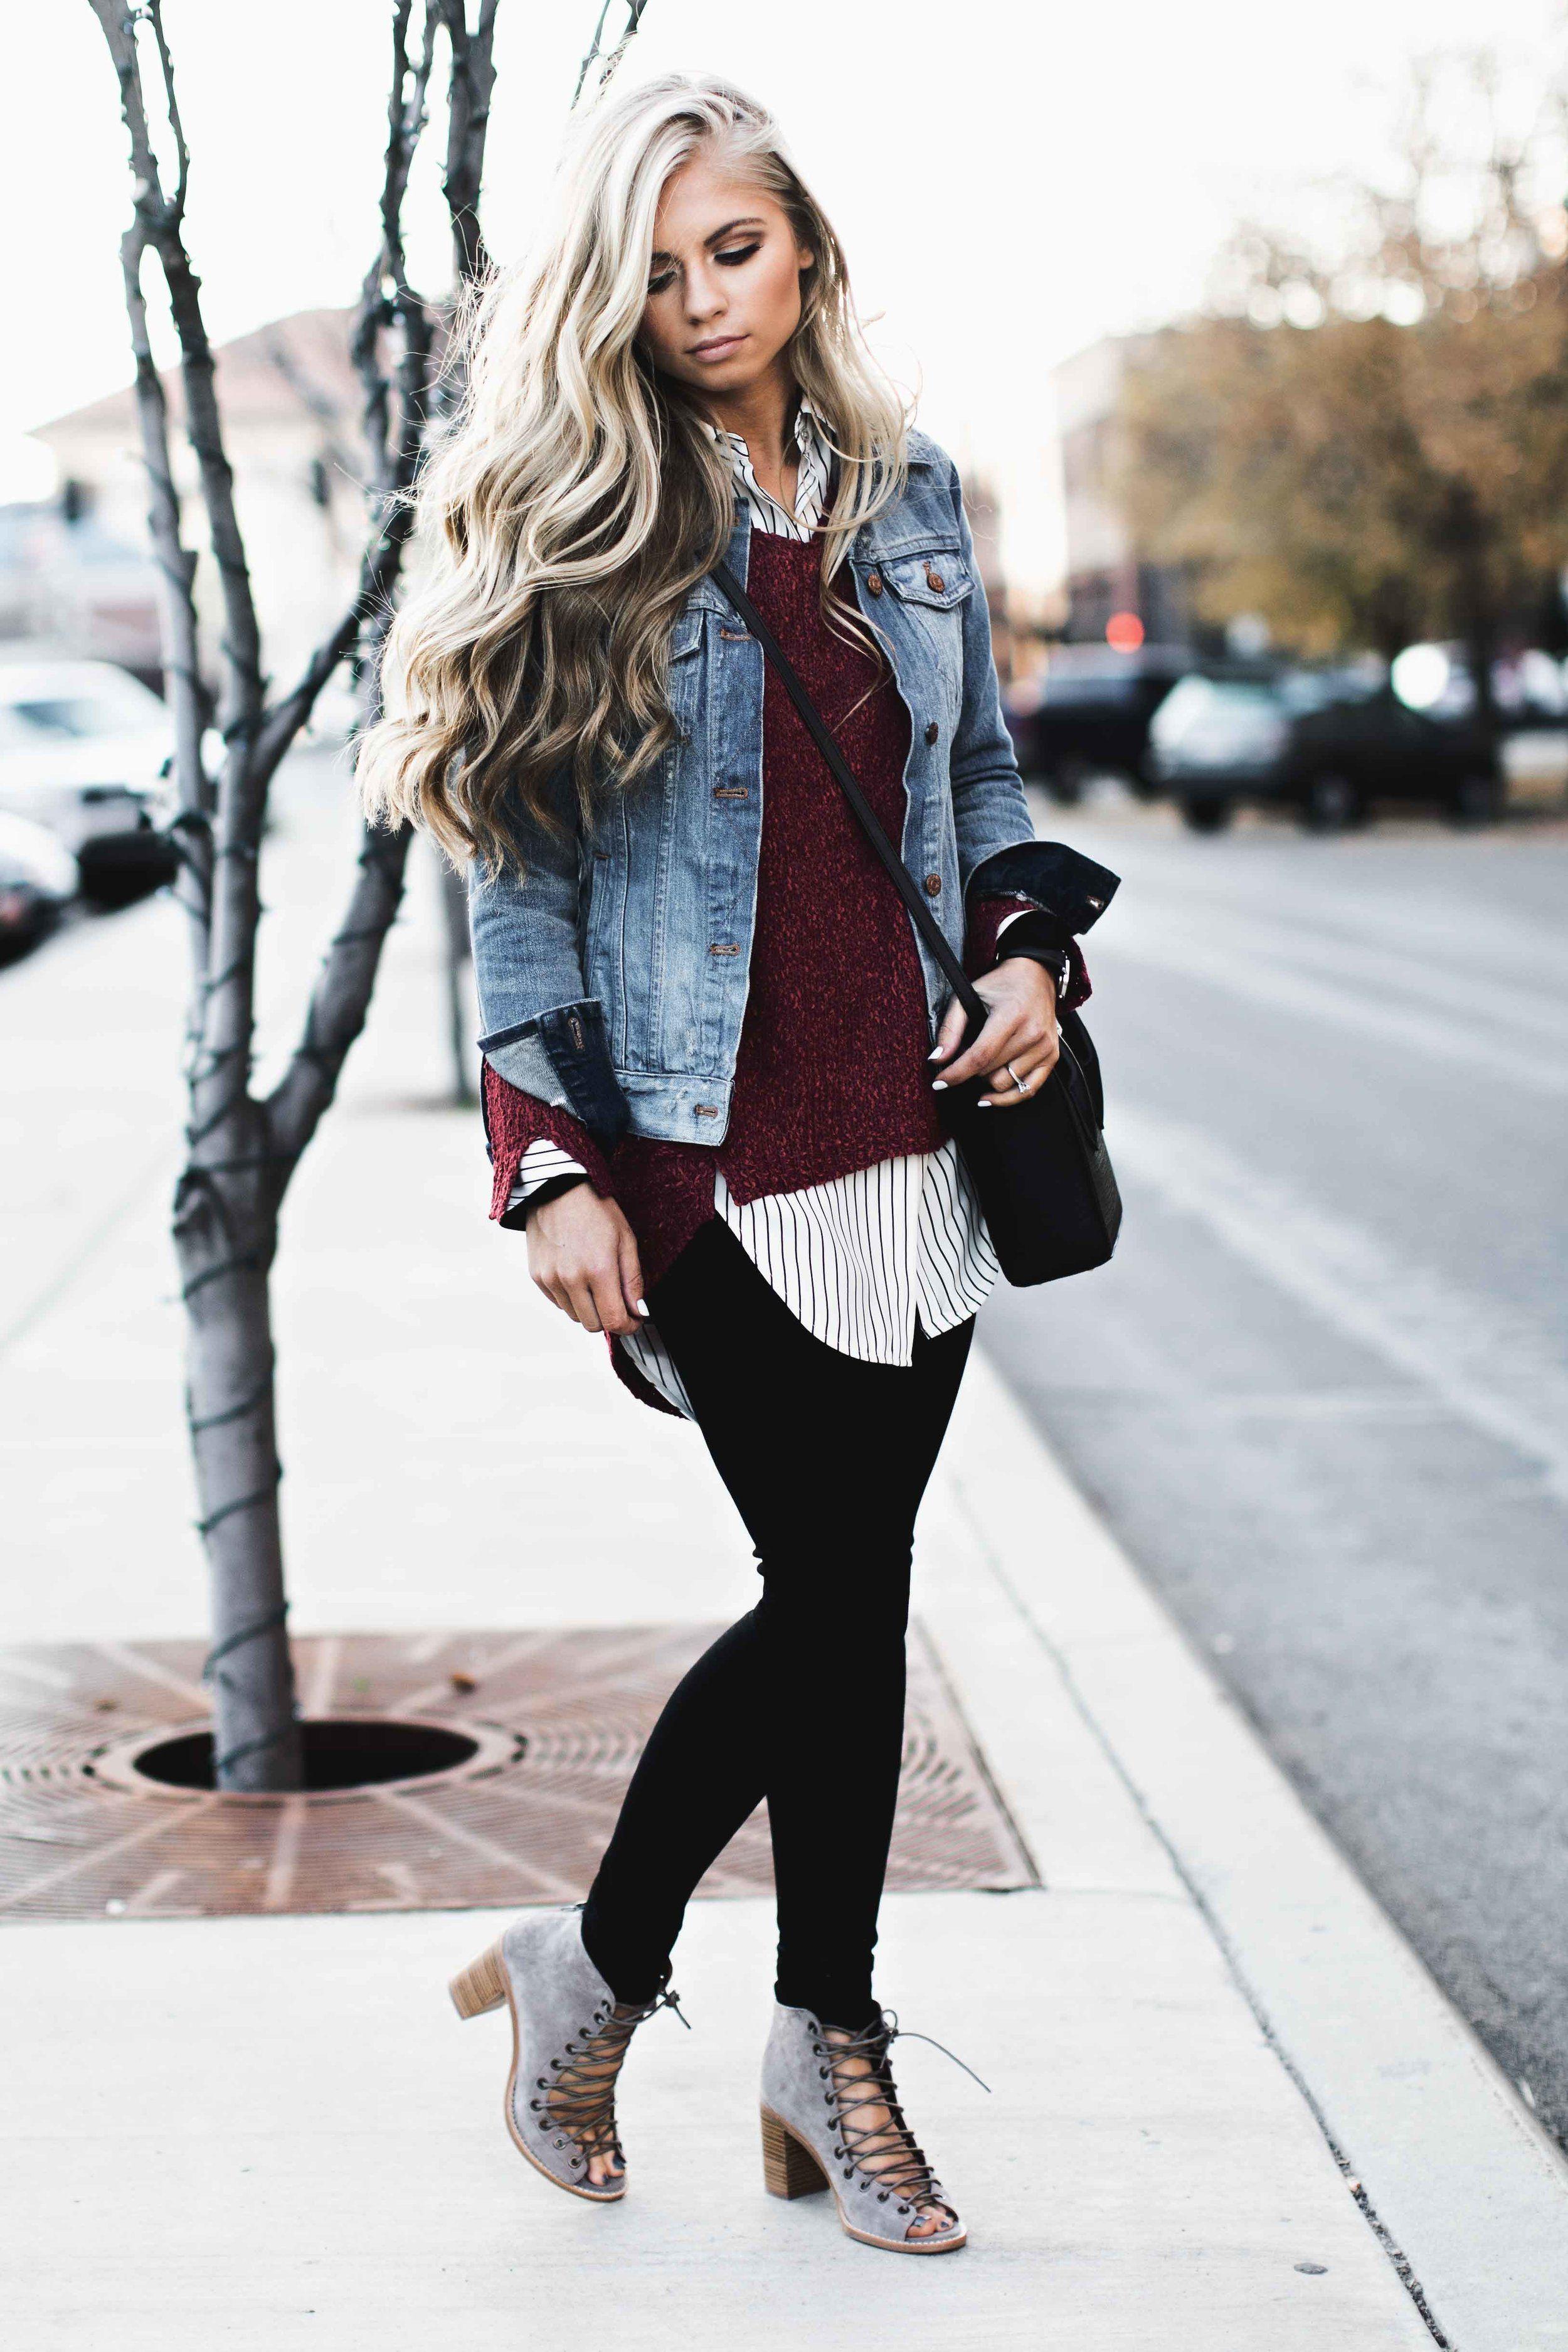 layered | My style | Denim jacket outfit winter, Fashion ...